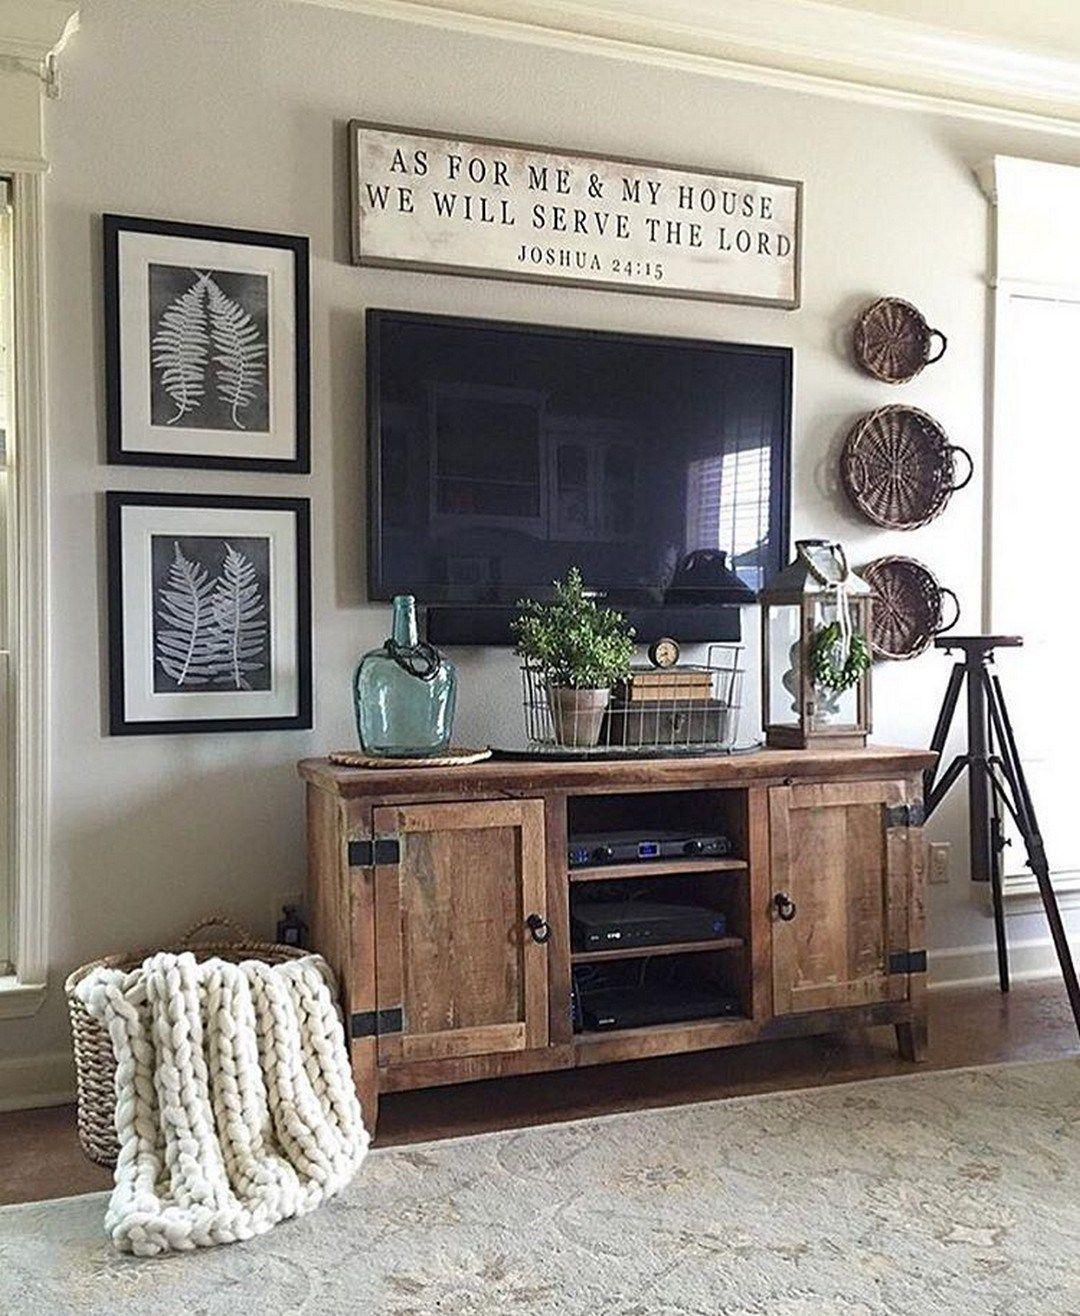 122 Cheap Easy And Simple Diy Rustic Home Decor Ideas 29 Farm House Living Room Country House Decor Cheap Home Decor